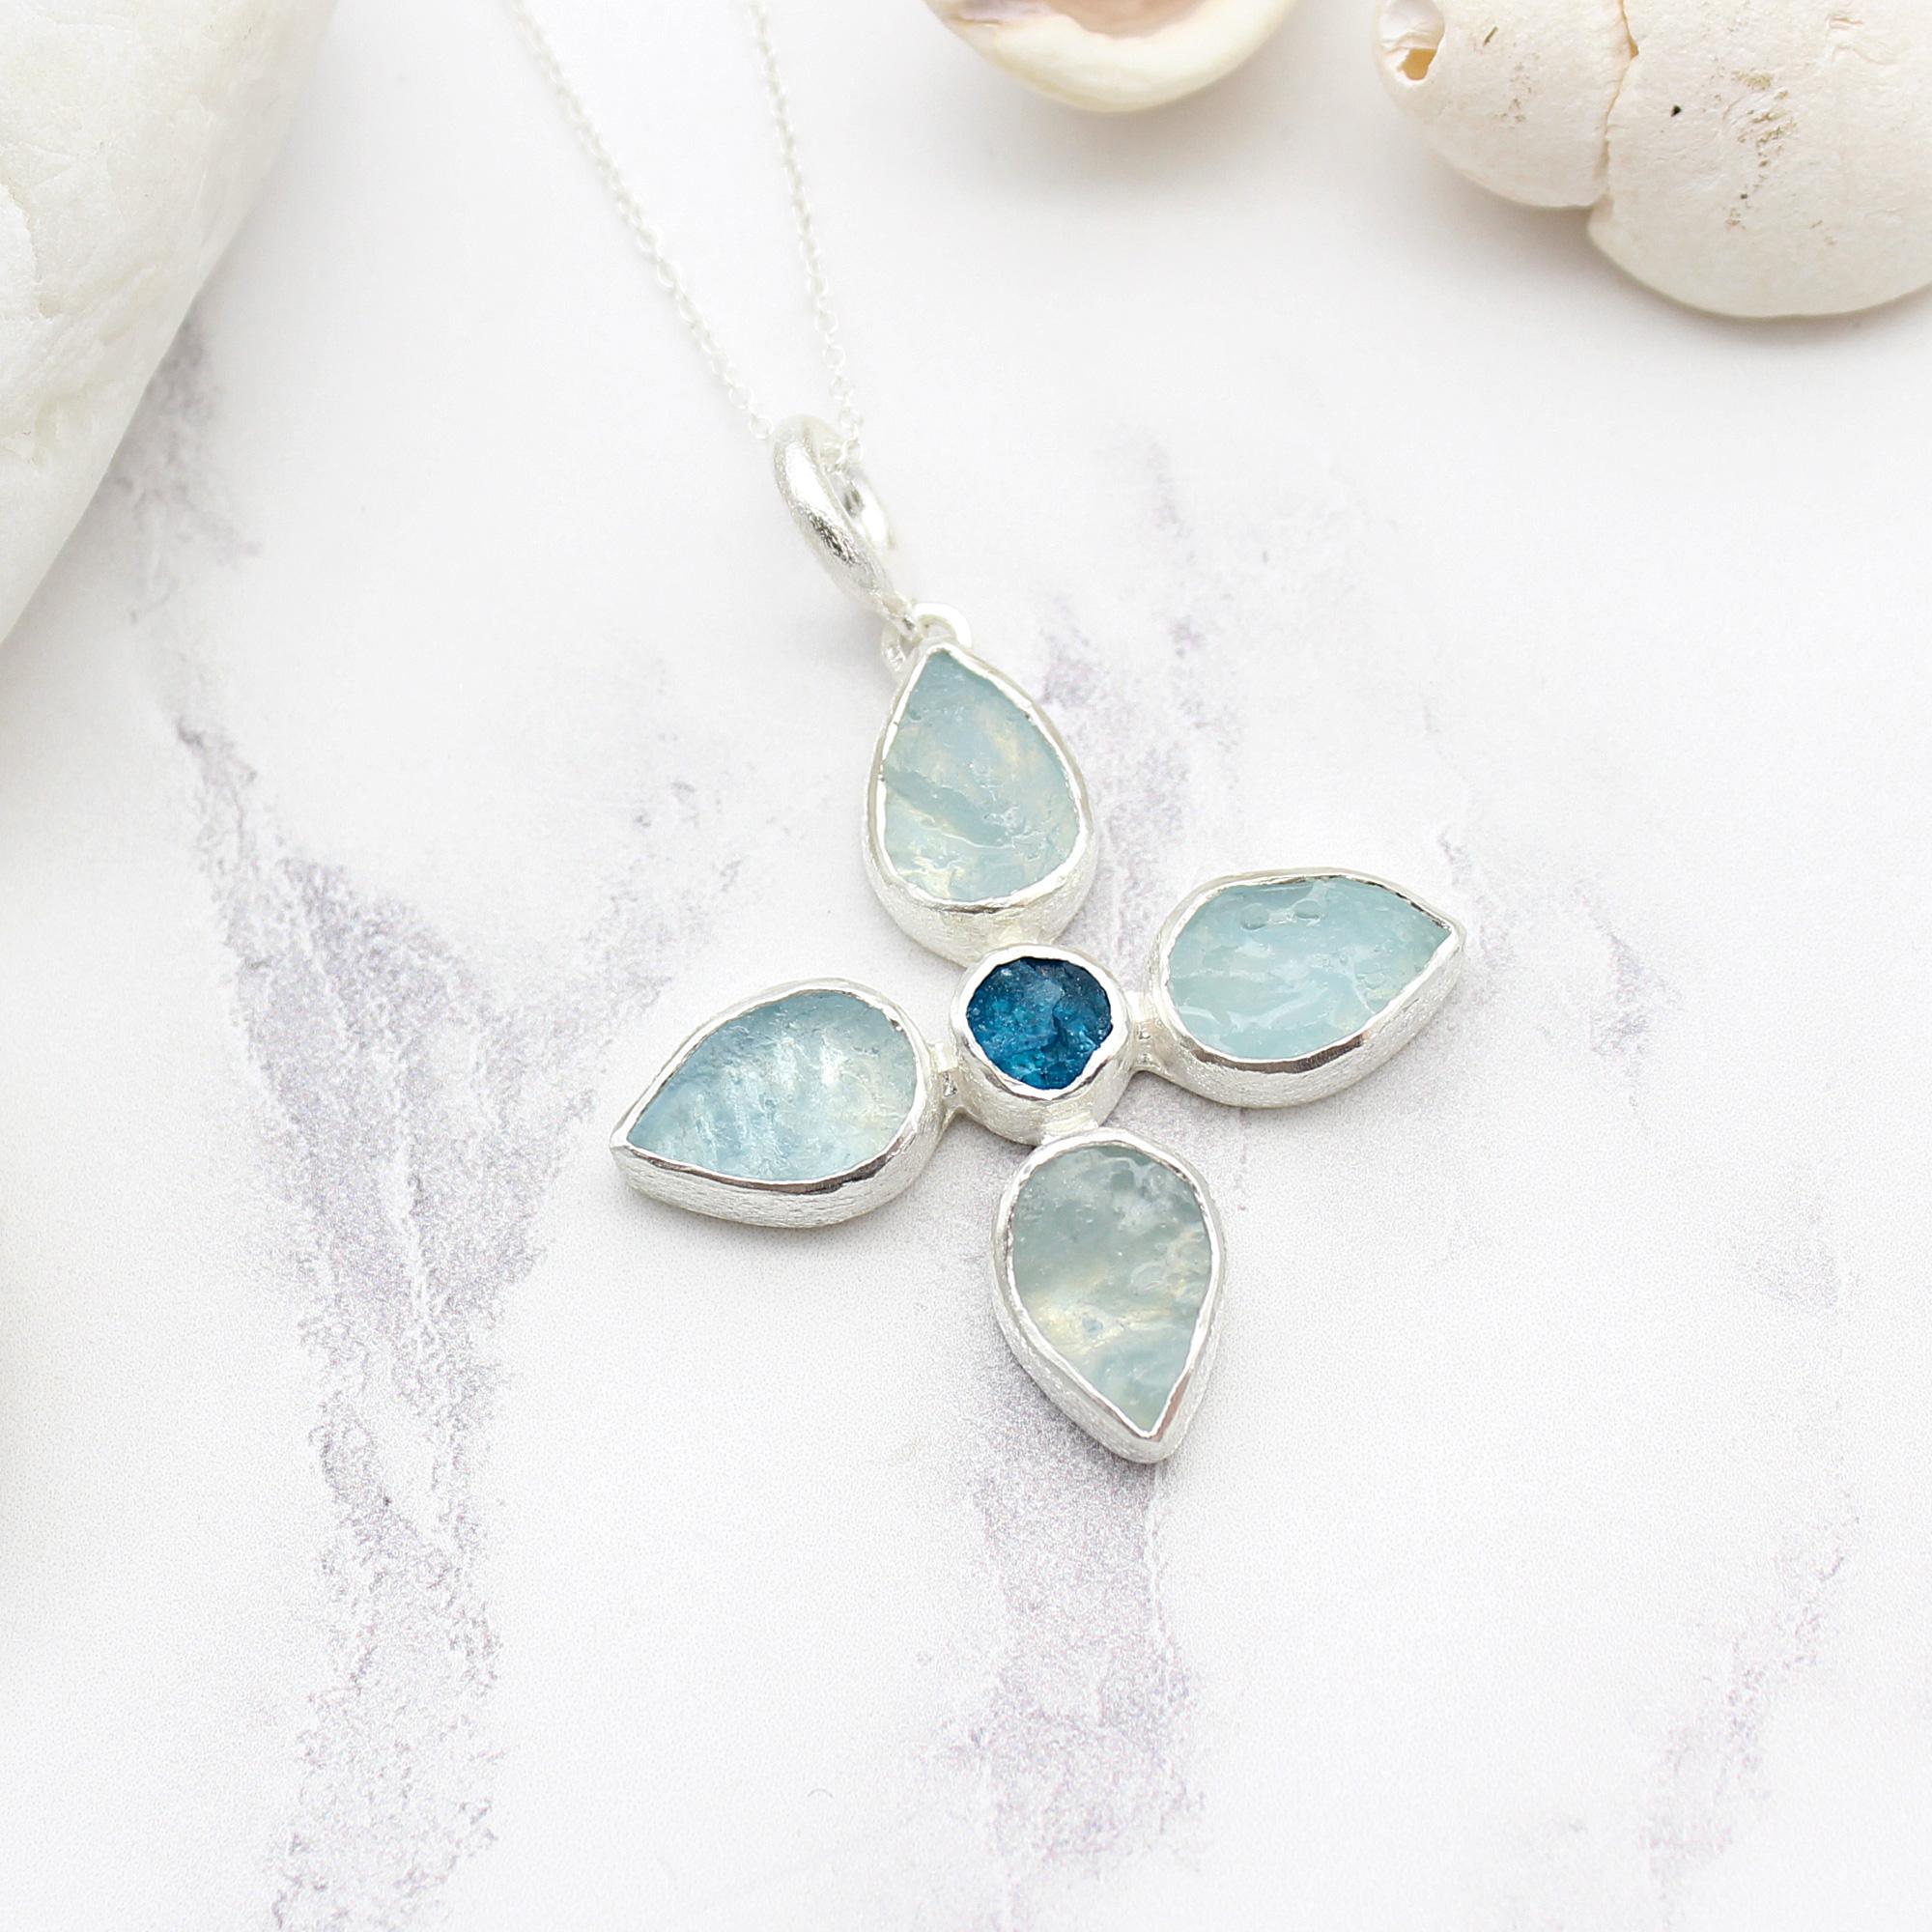 Handmade Aquamarine & Apatite Gemstone Flower Sterling Silver Pendant